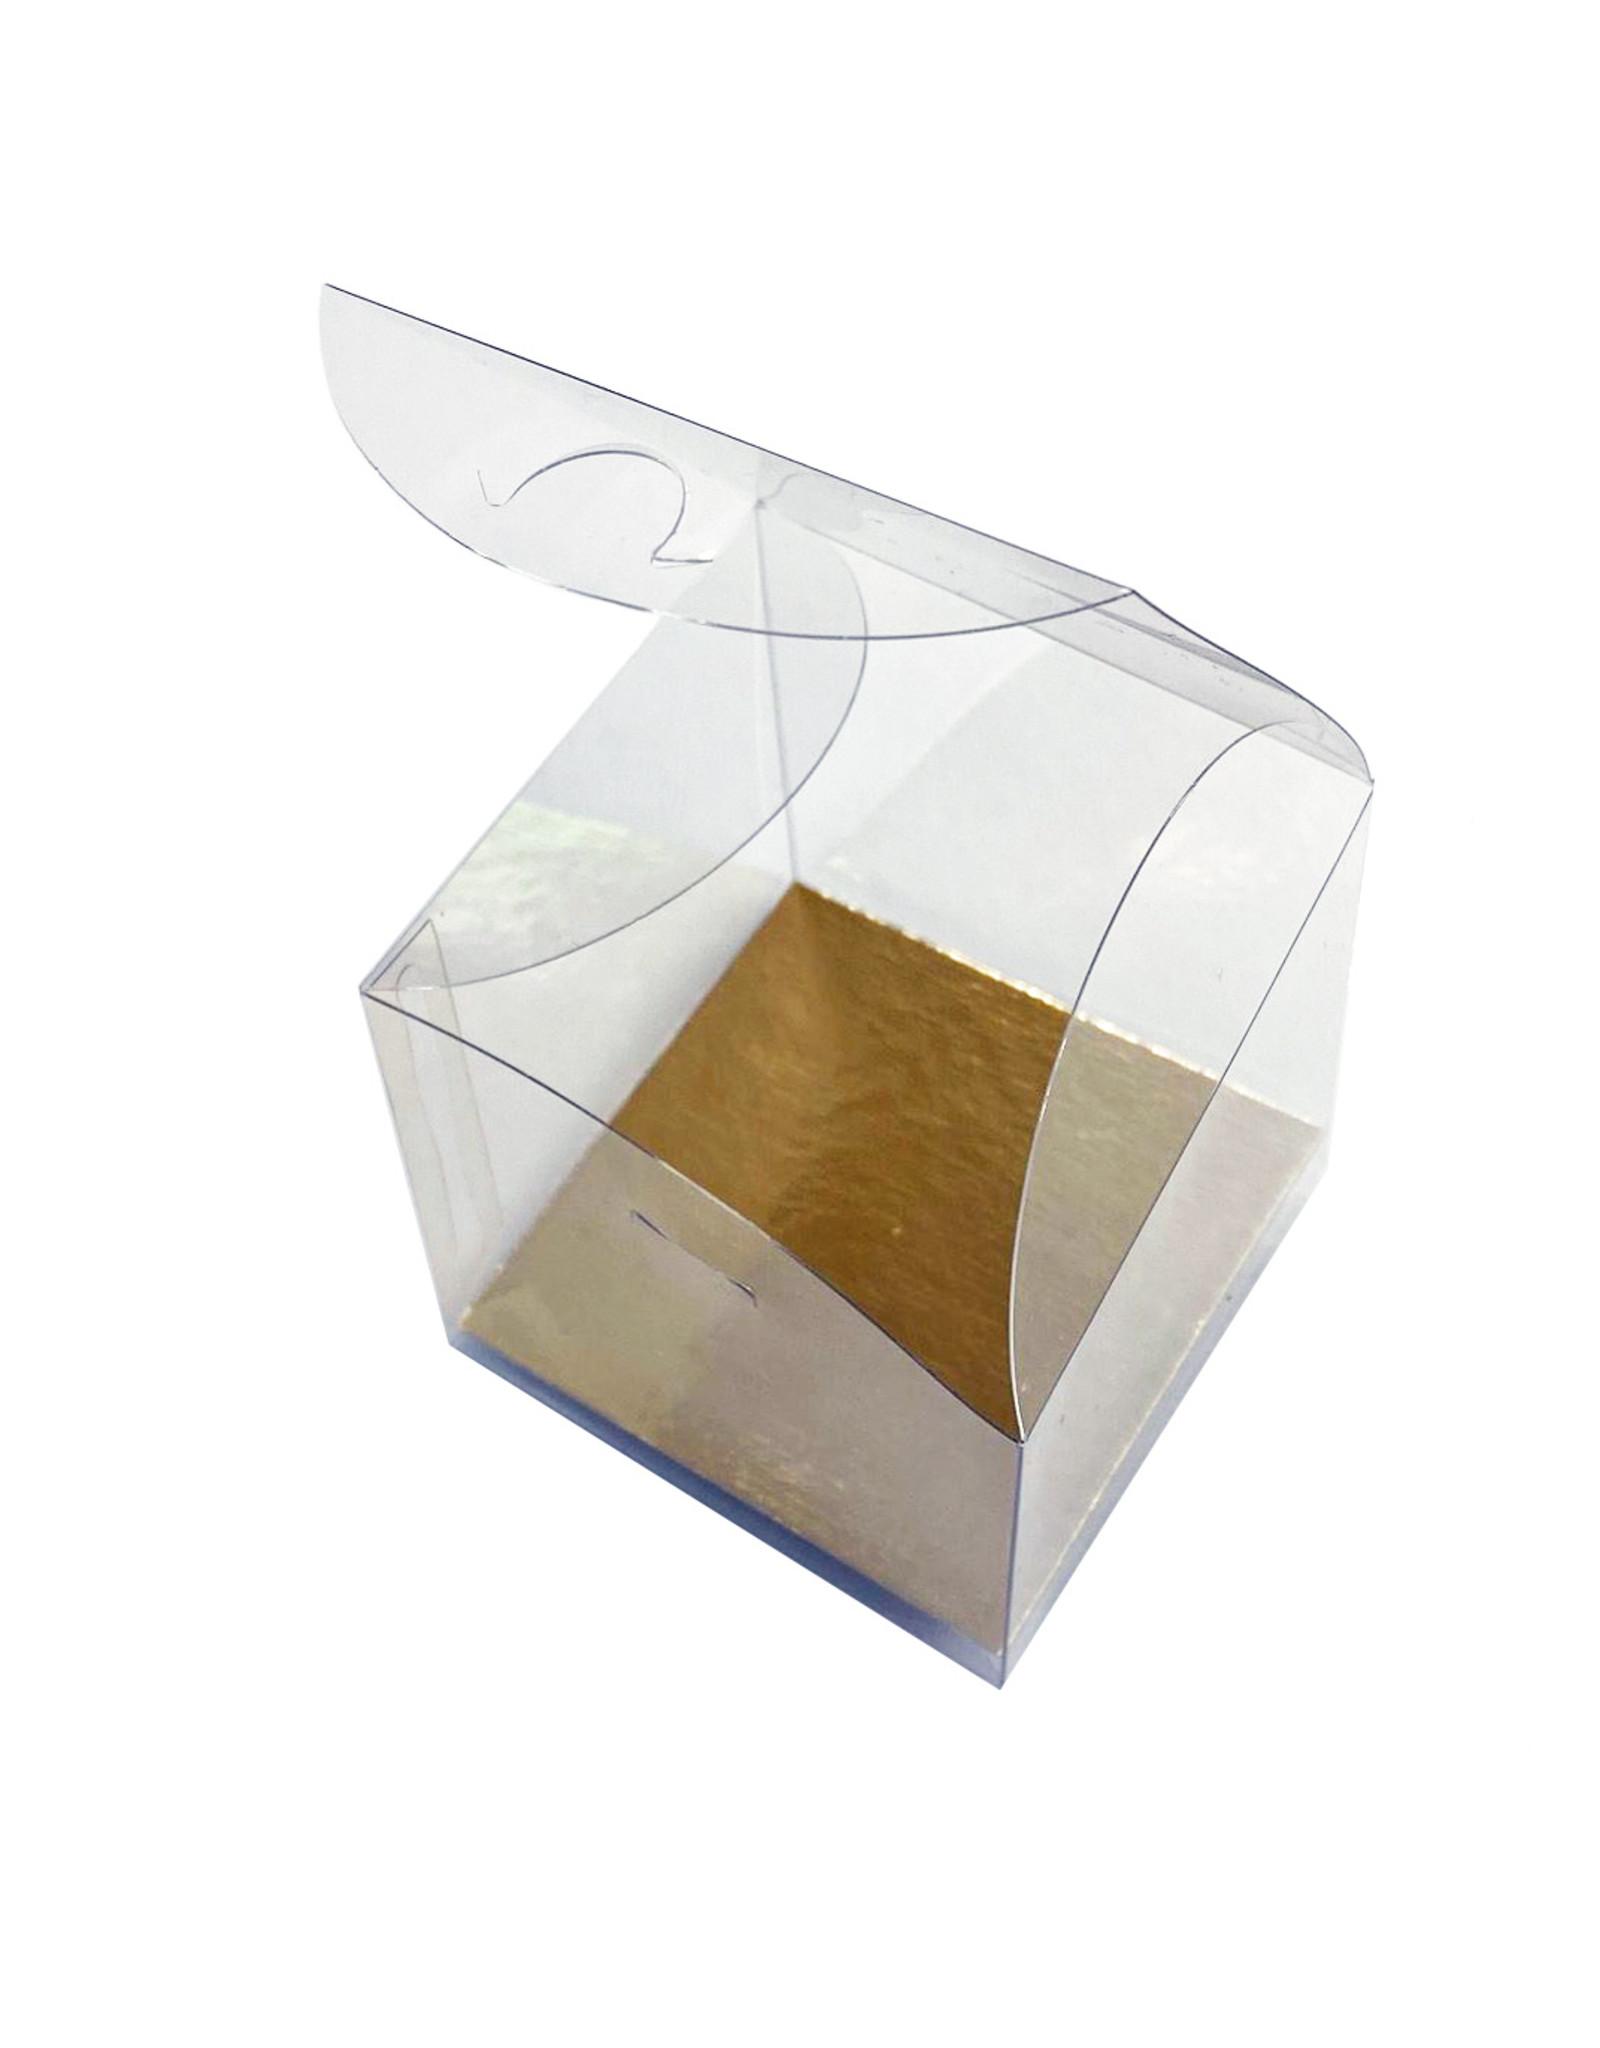 Transparent cube for 1 cupcake (per 100 pieces)